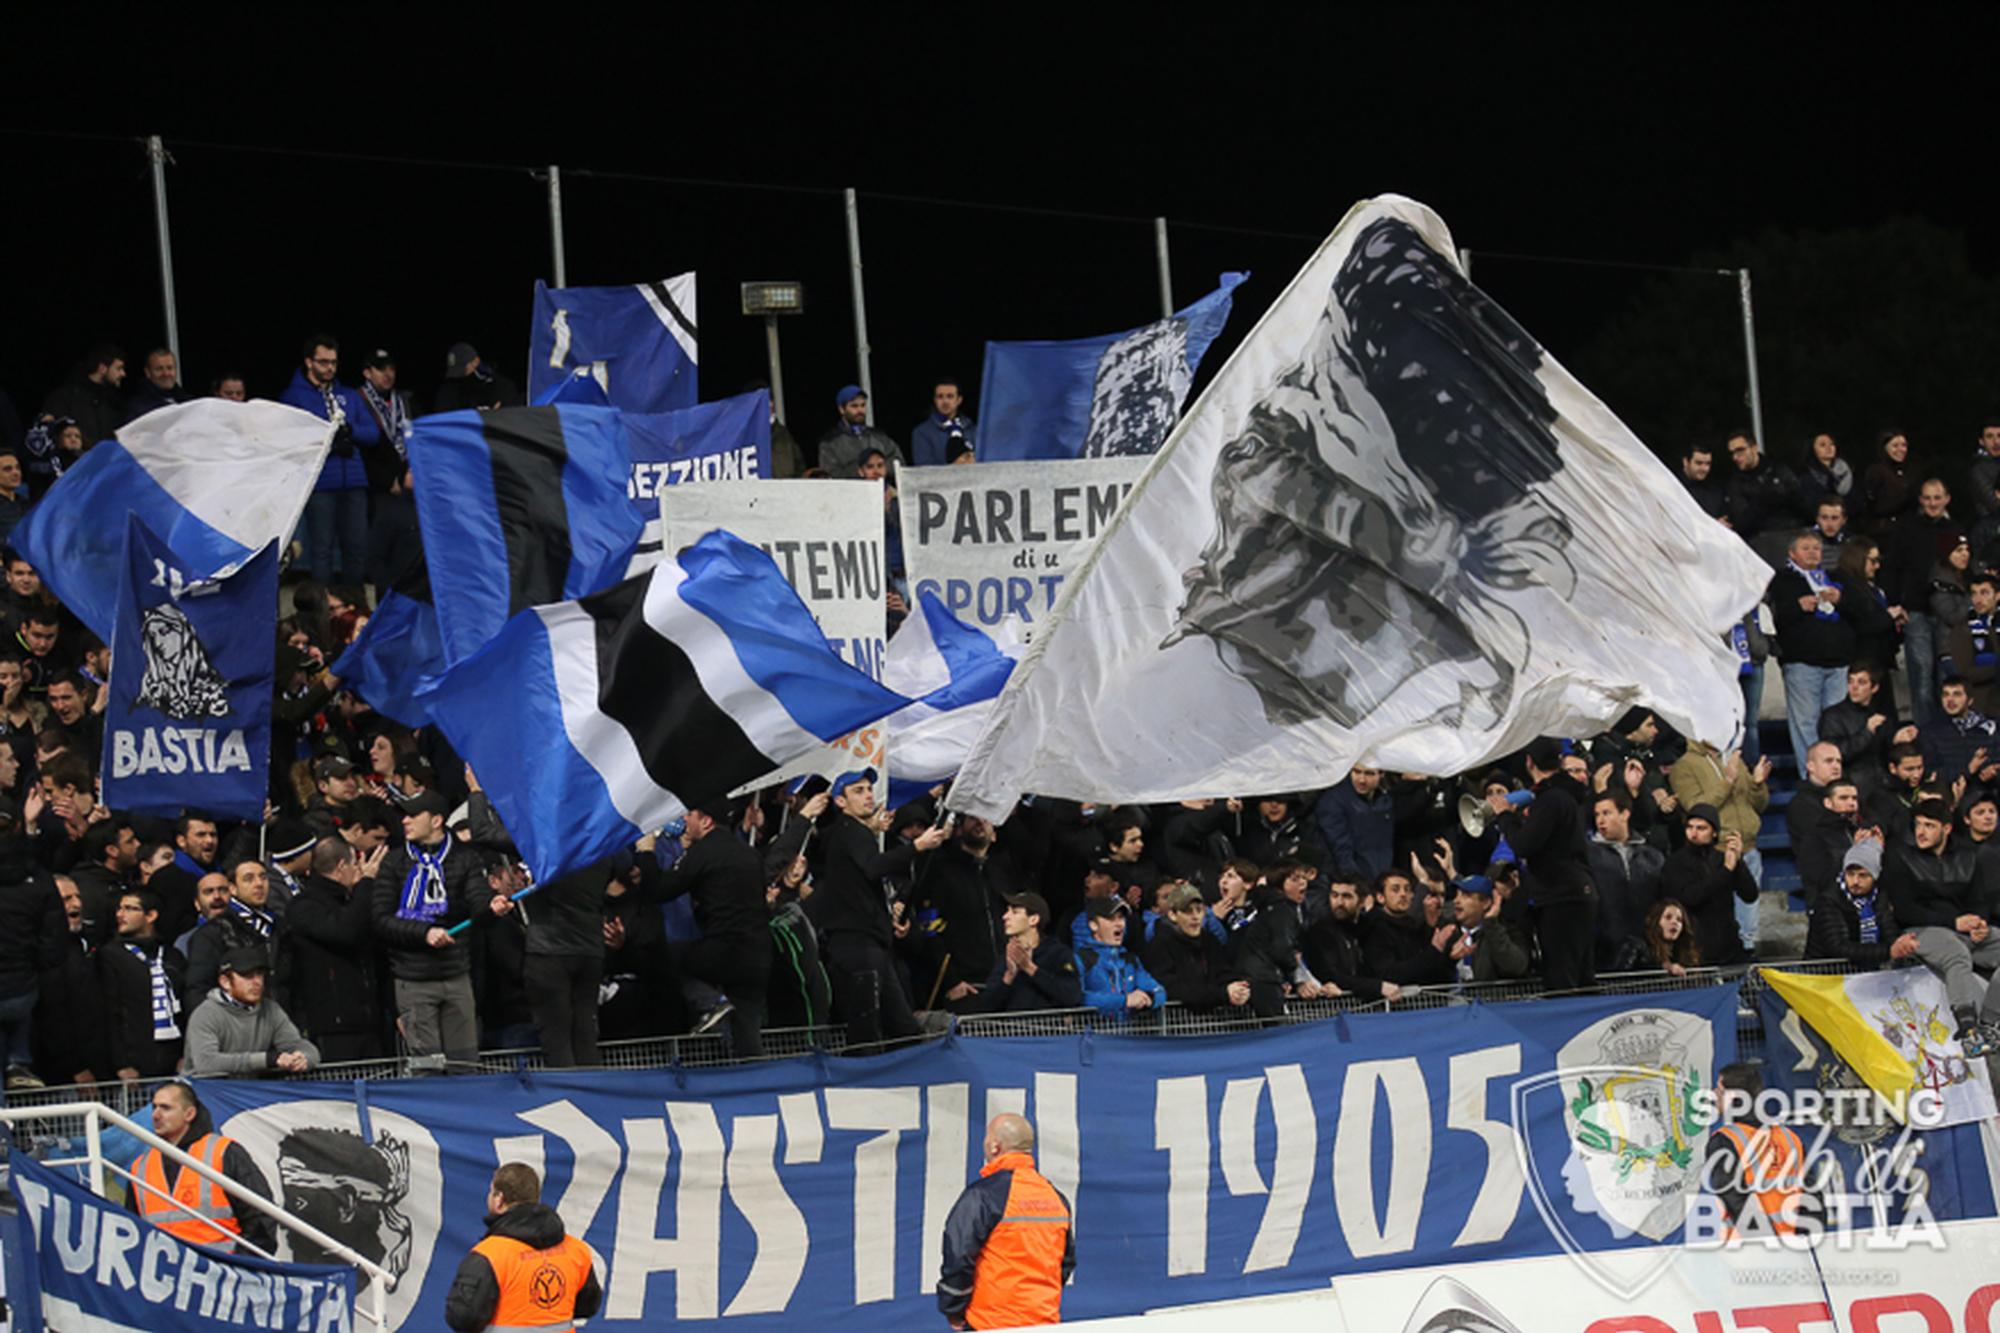 Bastia - Lyon